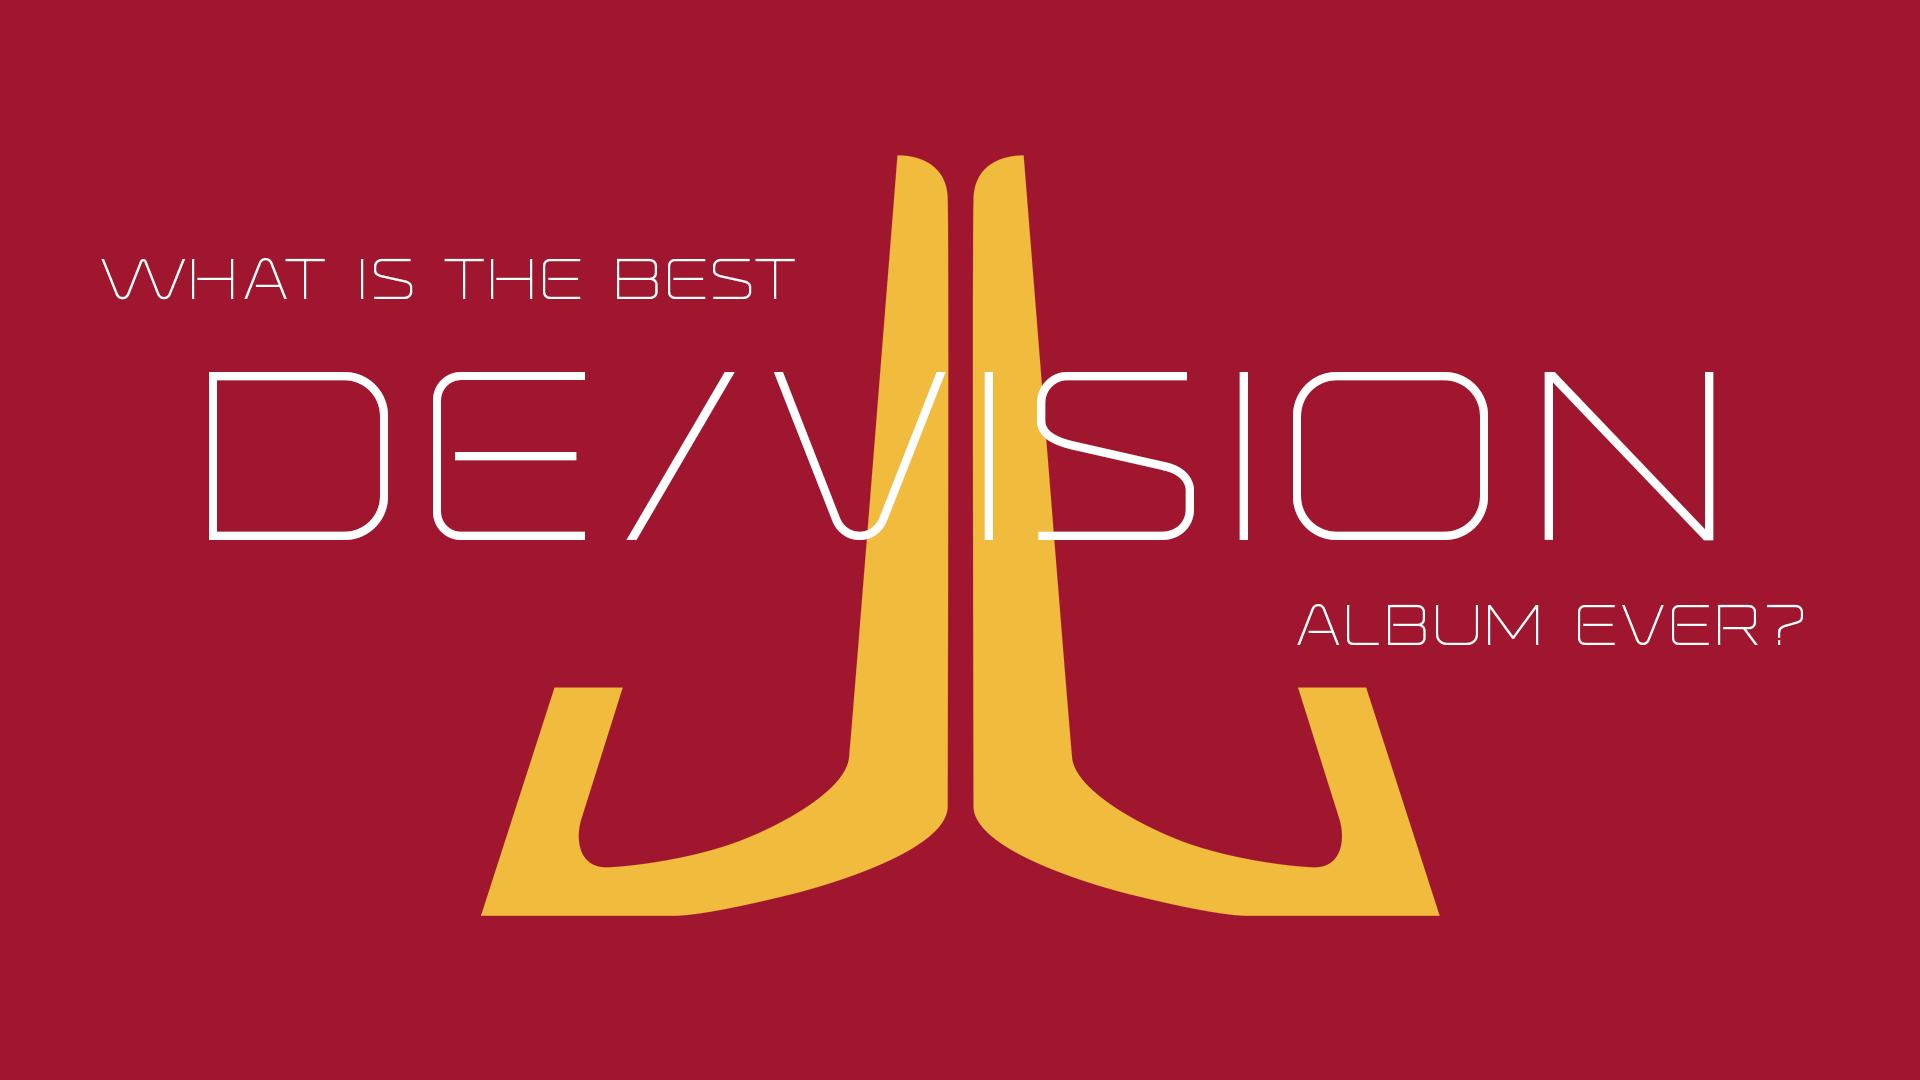 What is the best De/Vision album ever?